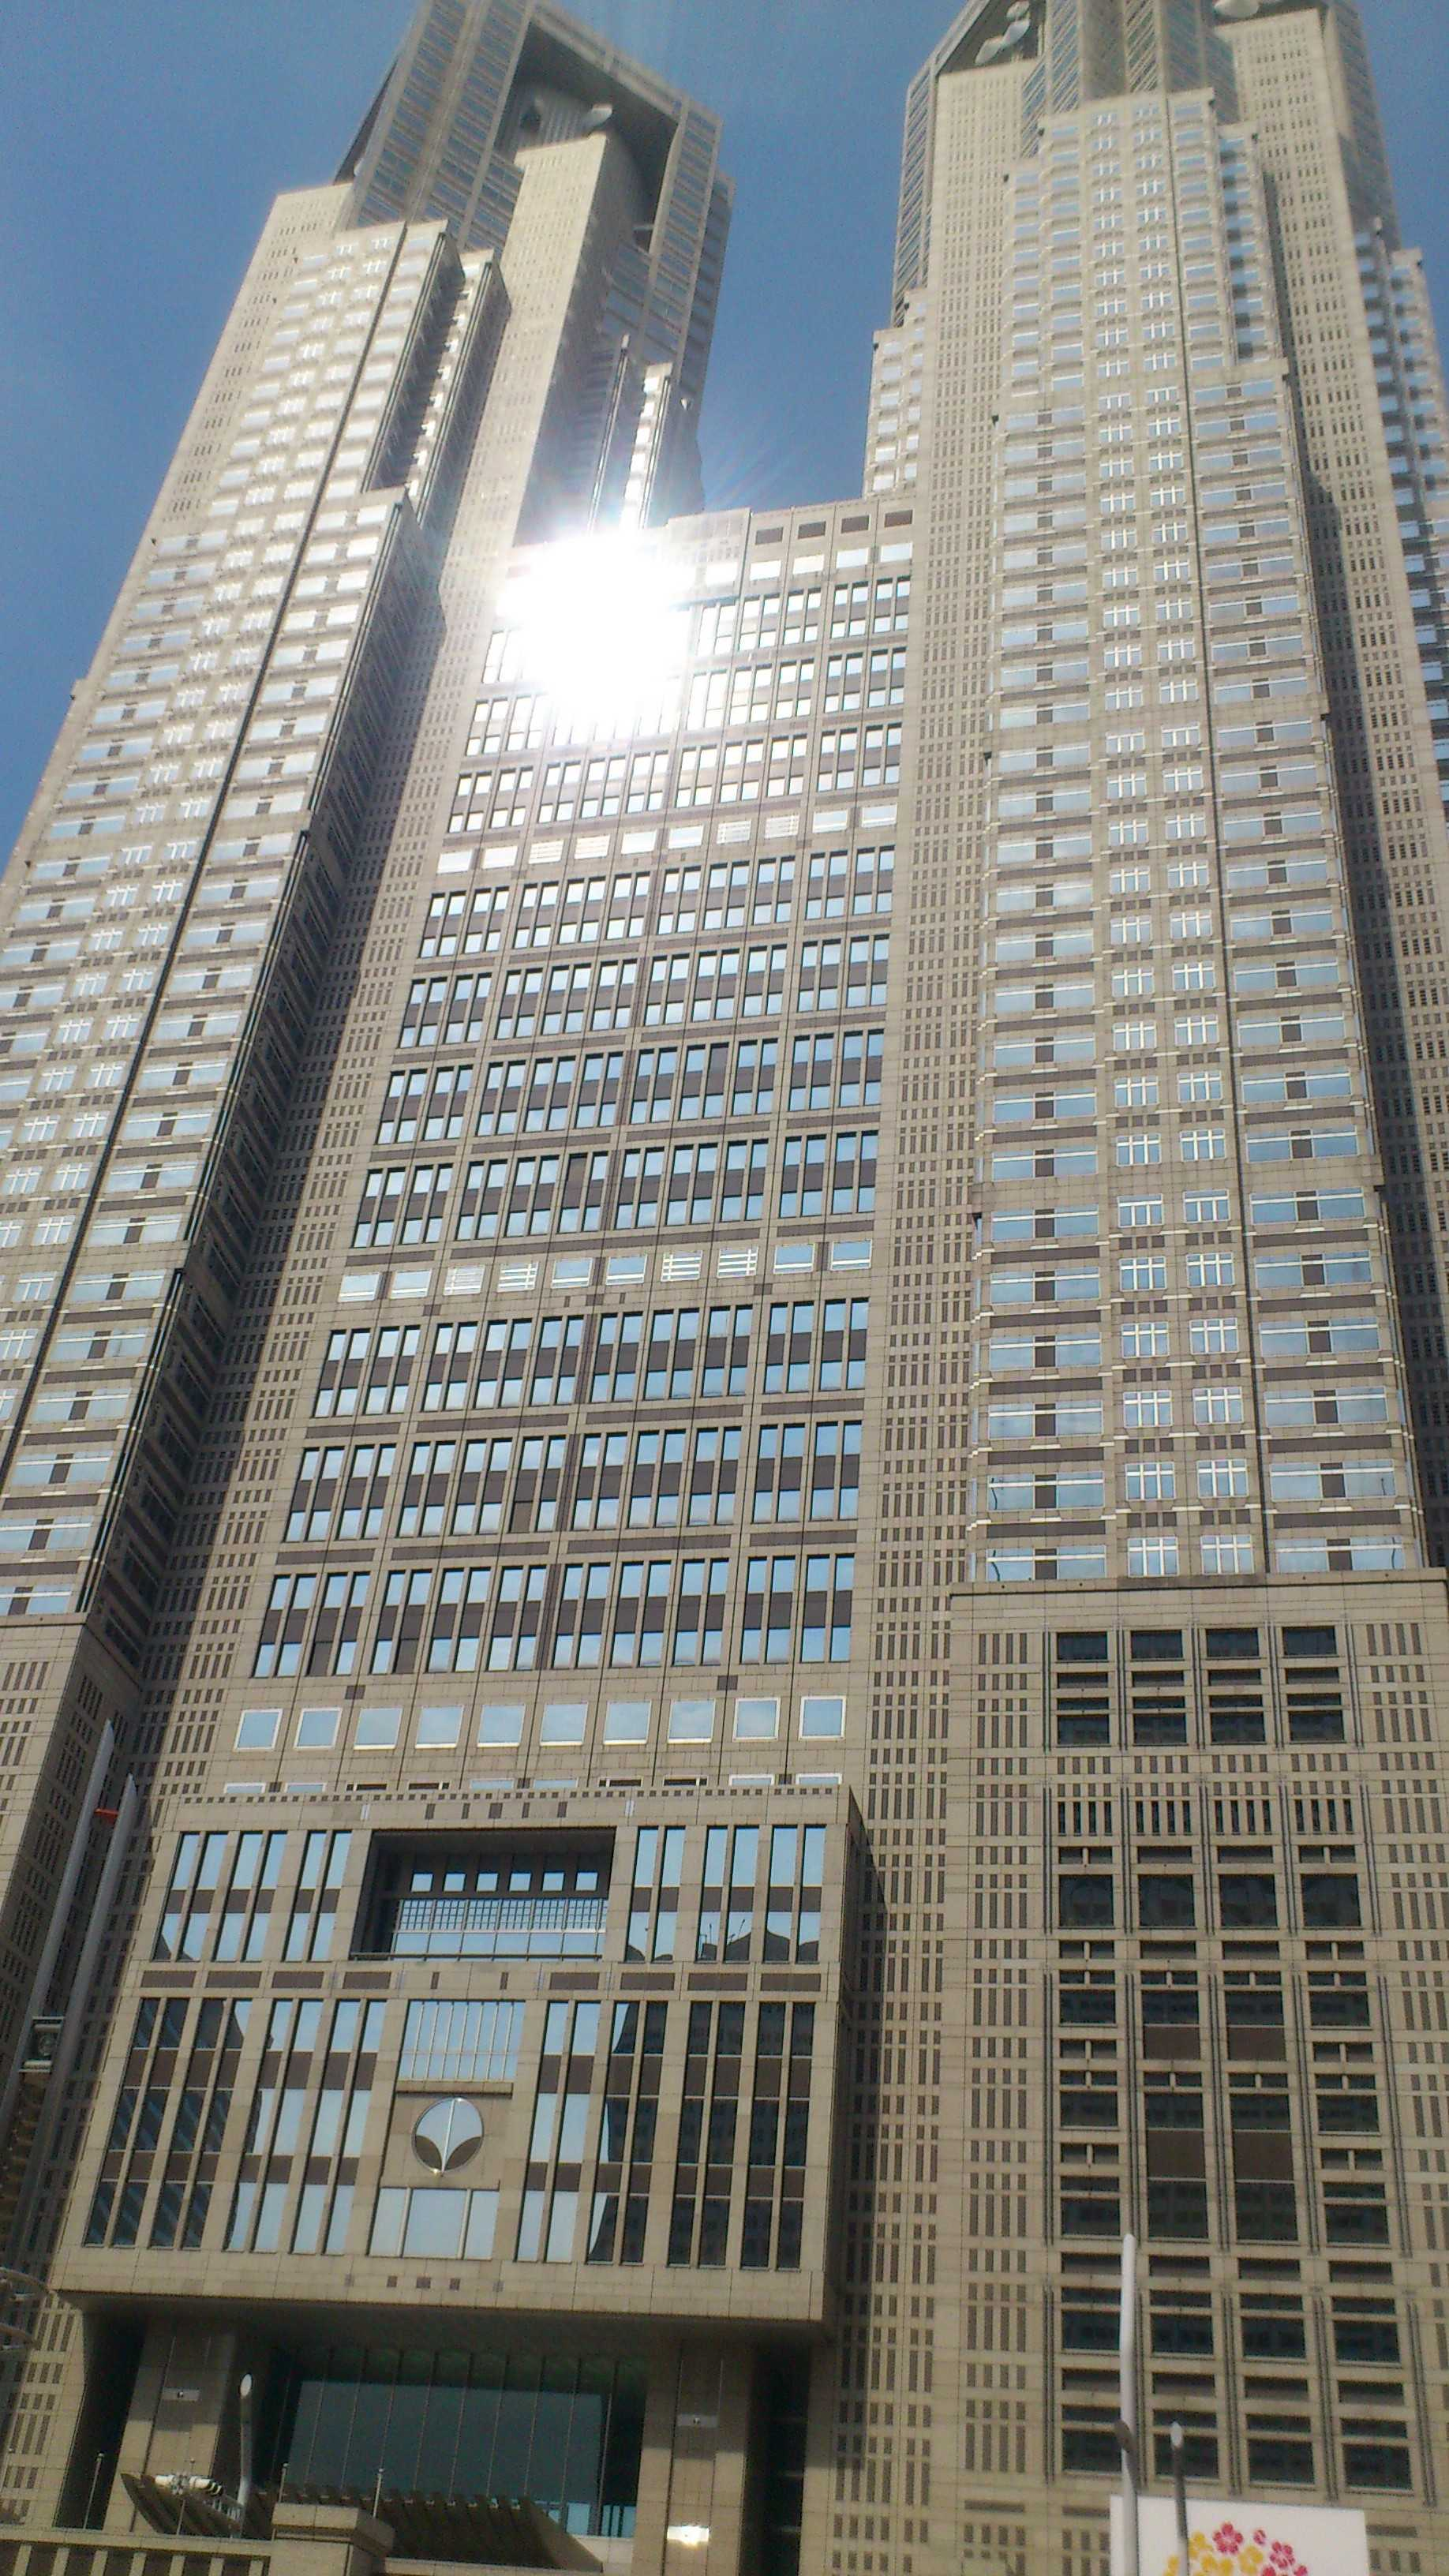 Tokyo governement center